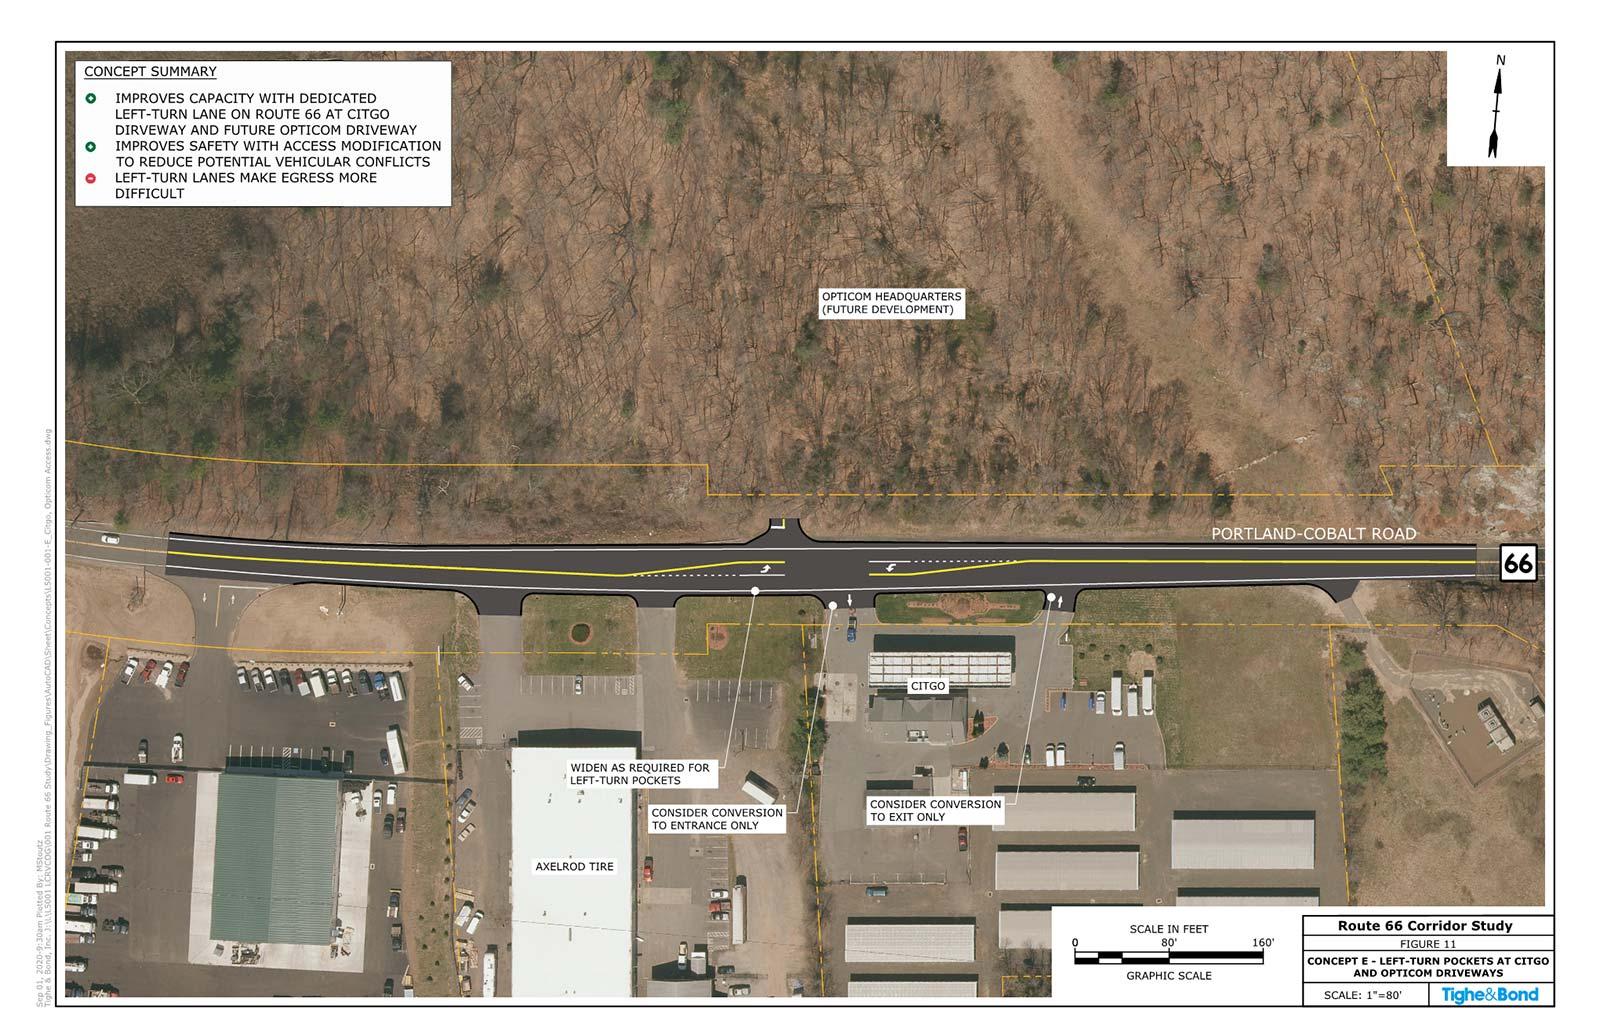 Route 66 at Portland Citgo and Opticom Driveways Operational Improvements (Concept E). Route 66 Transportation Study, Portland and East Hampton, CT.